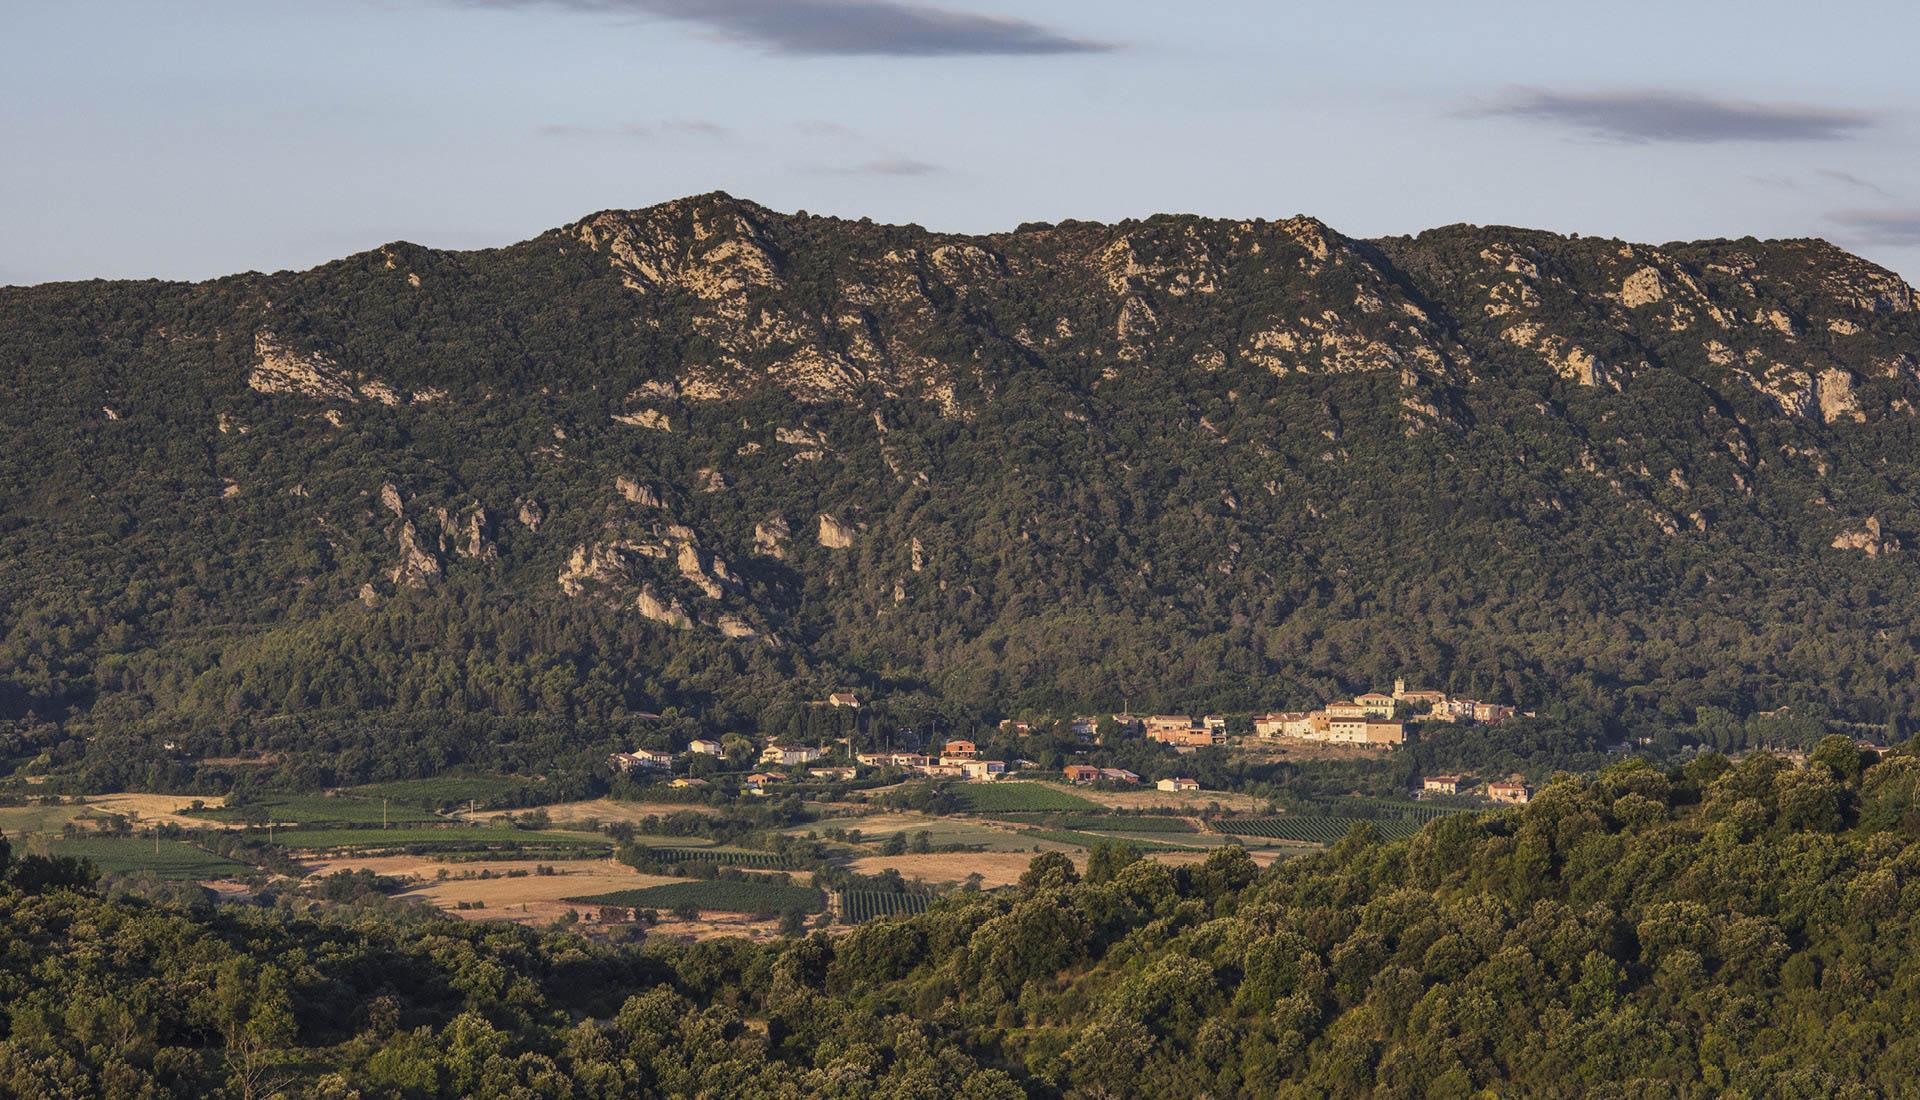 Montagne Liausson Christian Ferrer Wikimedia : CreativeCommons